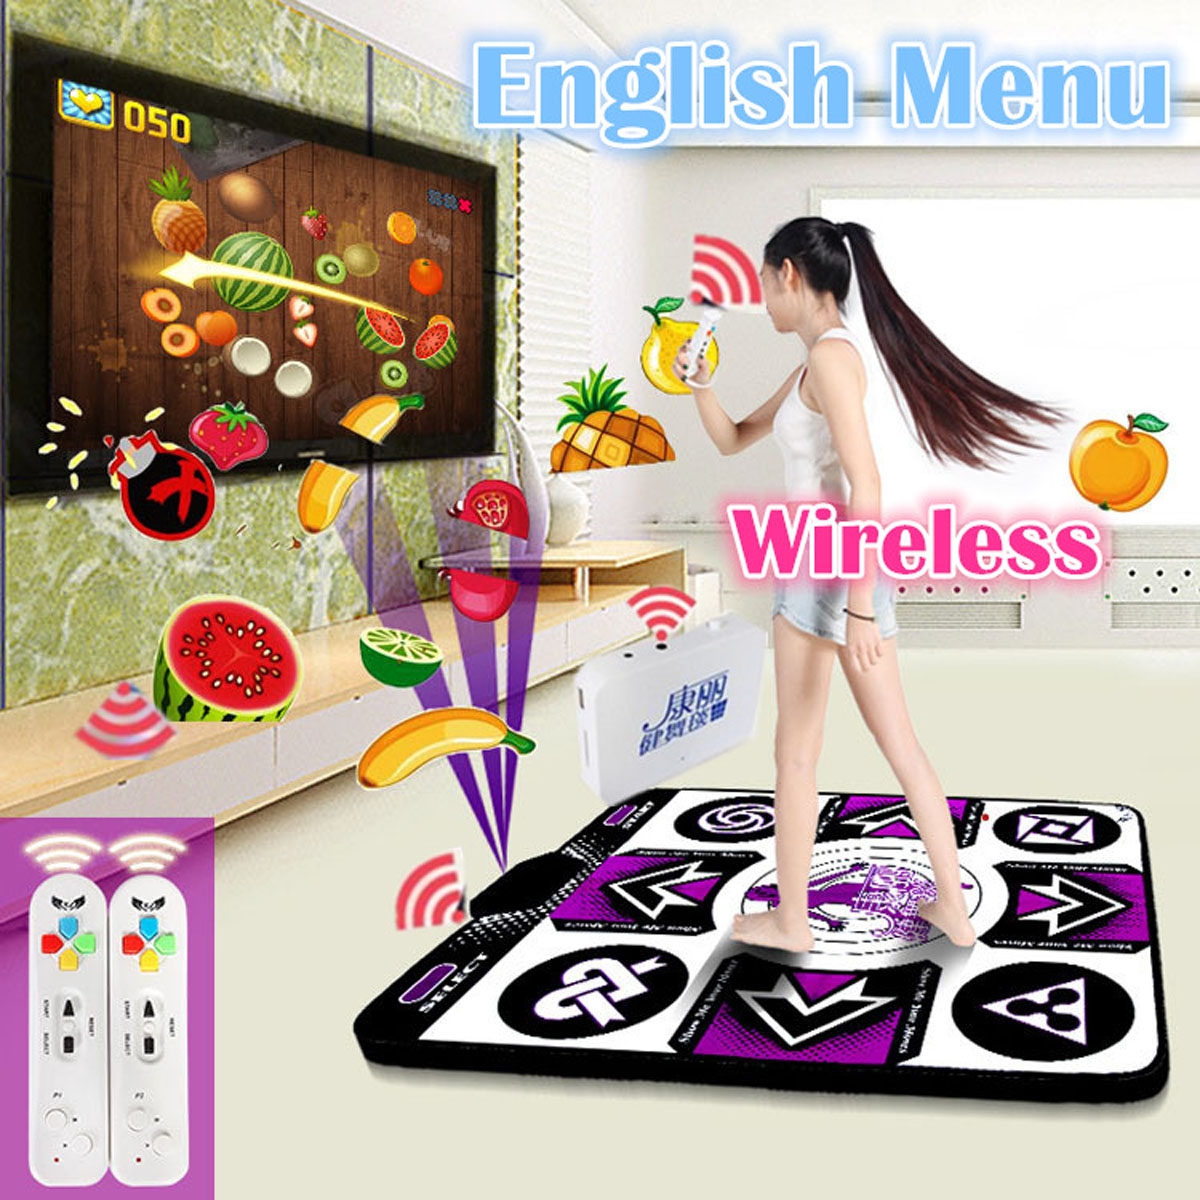 Original KL English Menu 11 Mm Thickness Single Dance Pad Non-Slip Pad Yoga Mat + 2 Remote Controller Sense Game For PC & TV